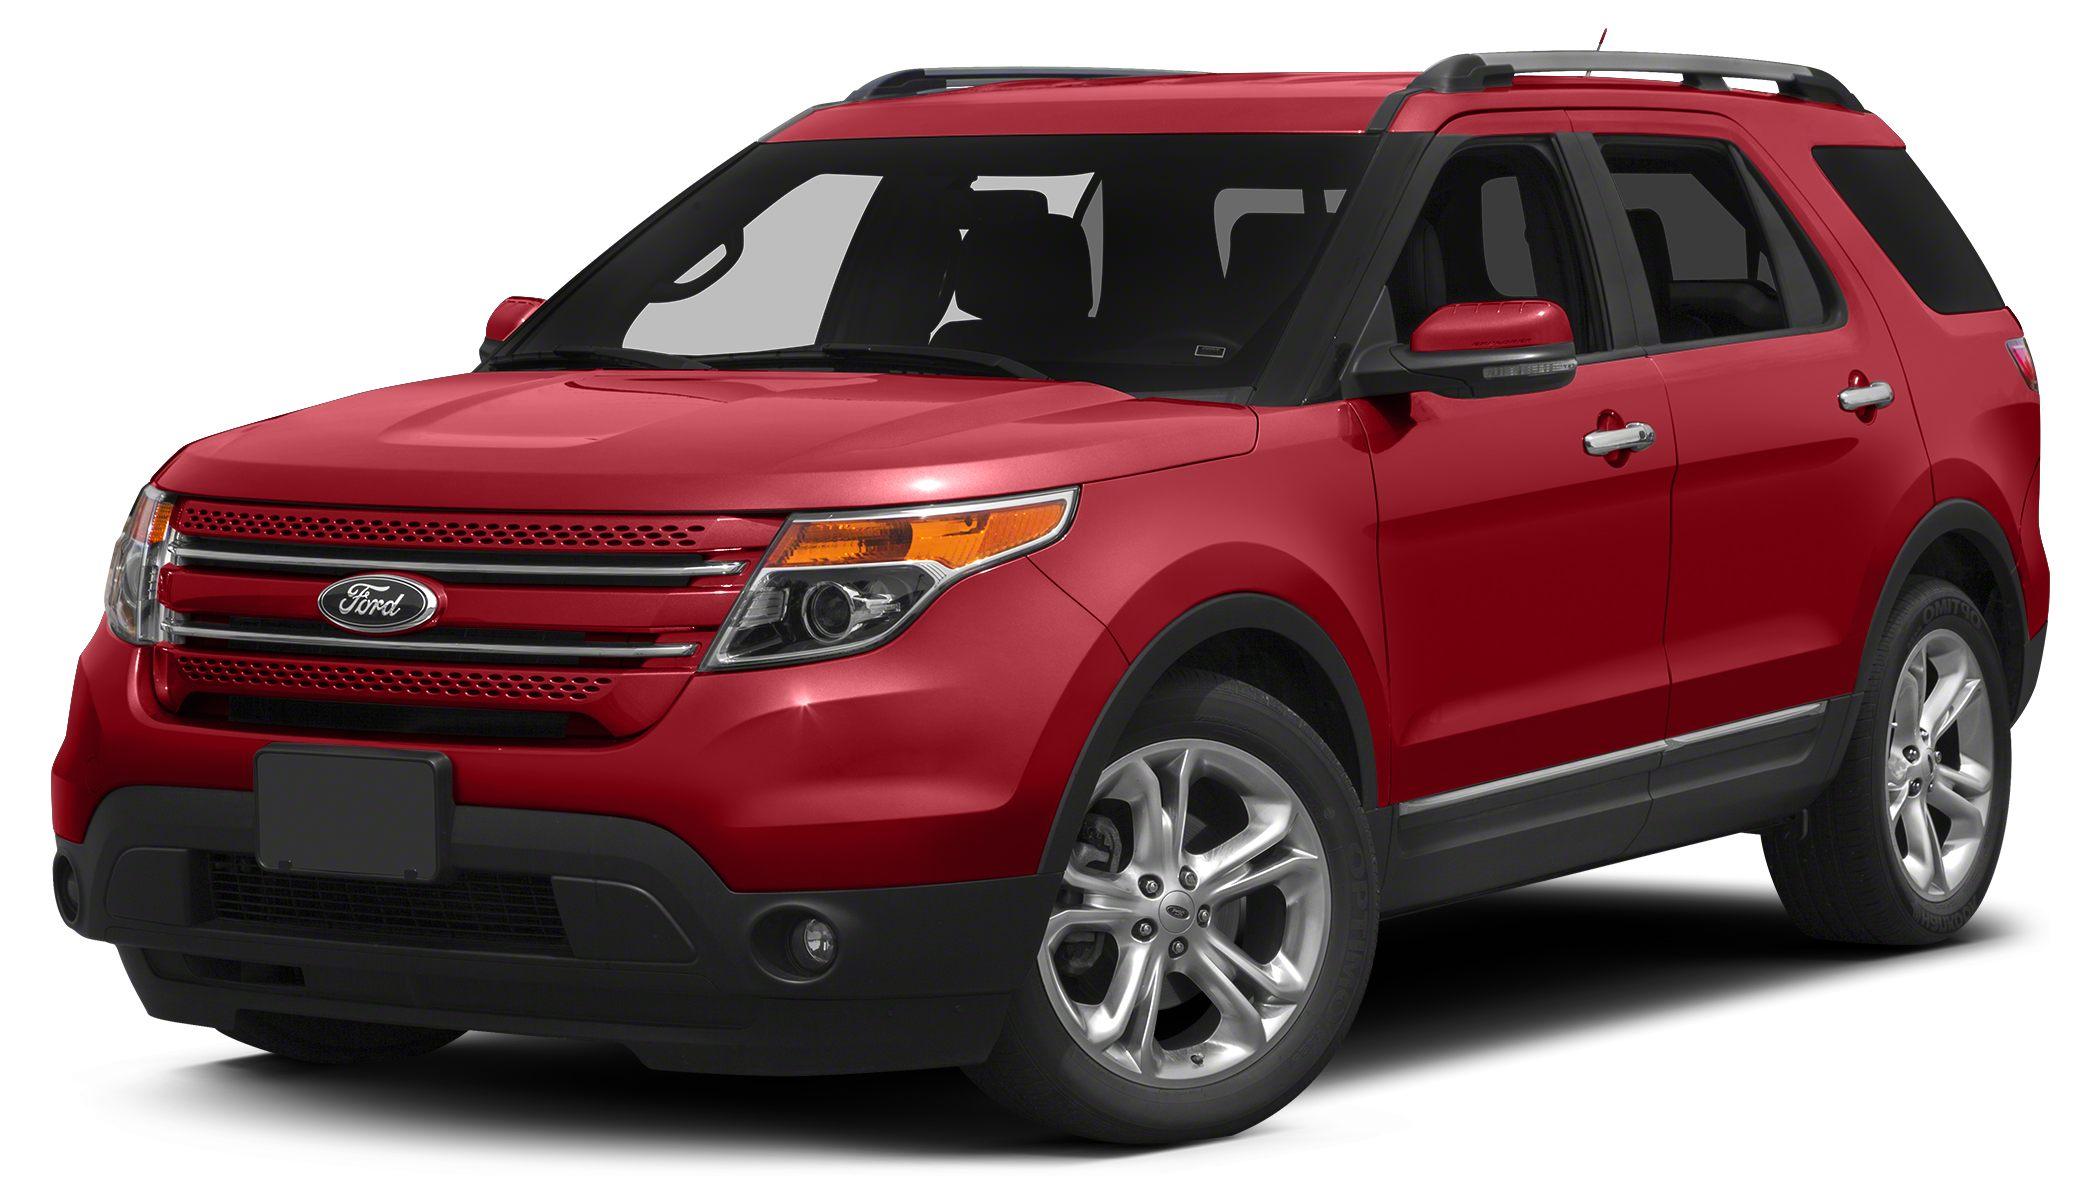 2013 Ford Explorer Limited Miles 33629Color Red Stock R8924Z VIN 1FM5K8F83DGC16672